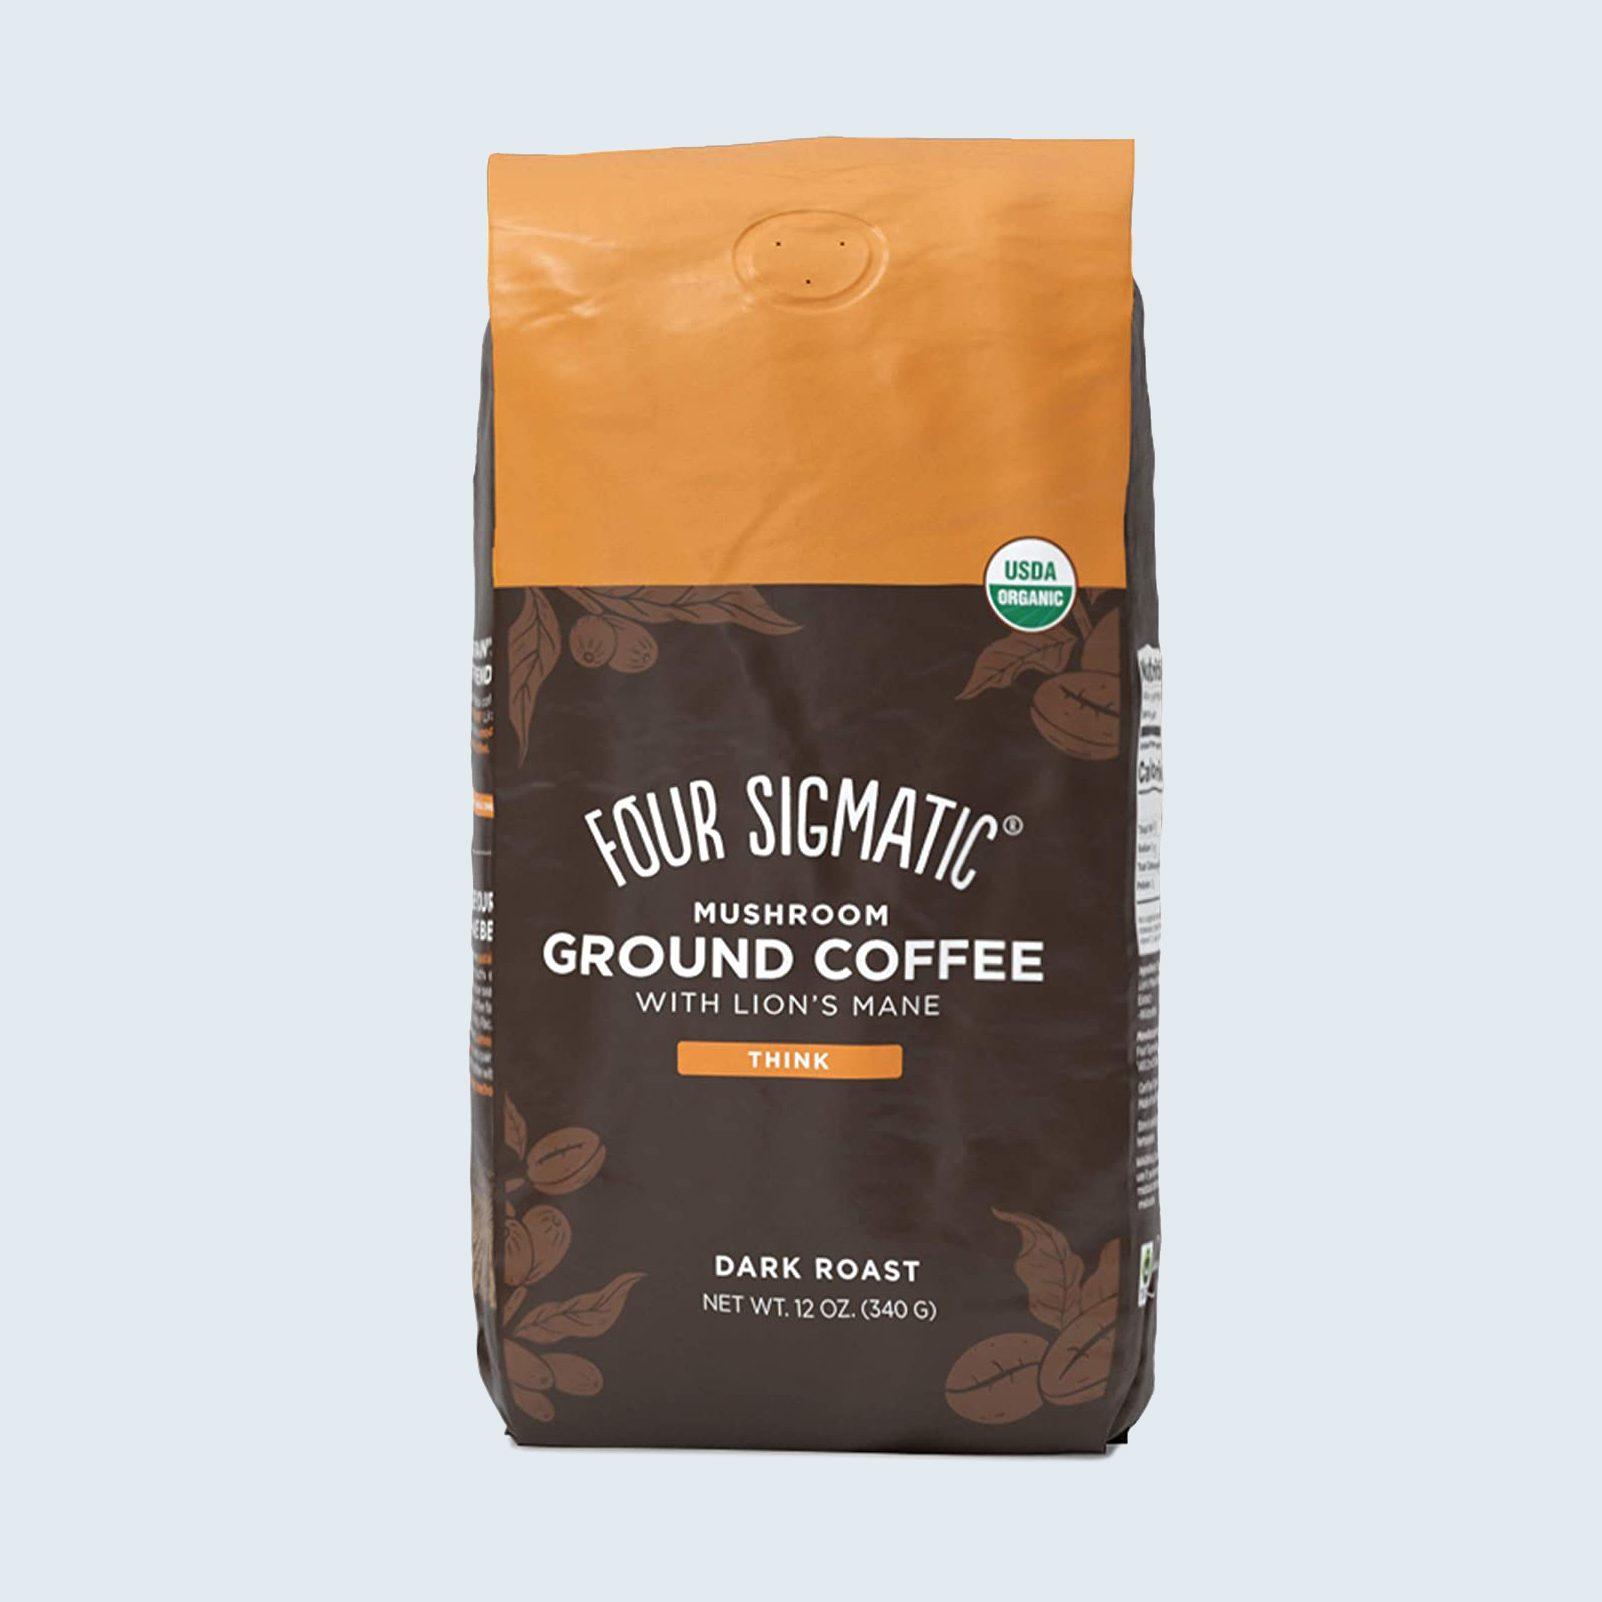 Foursigmatic Mushroom coffee